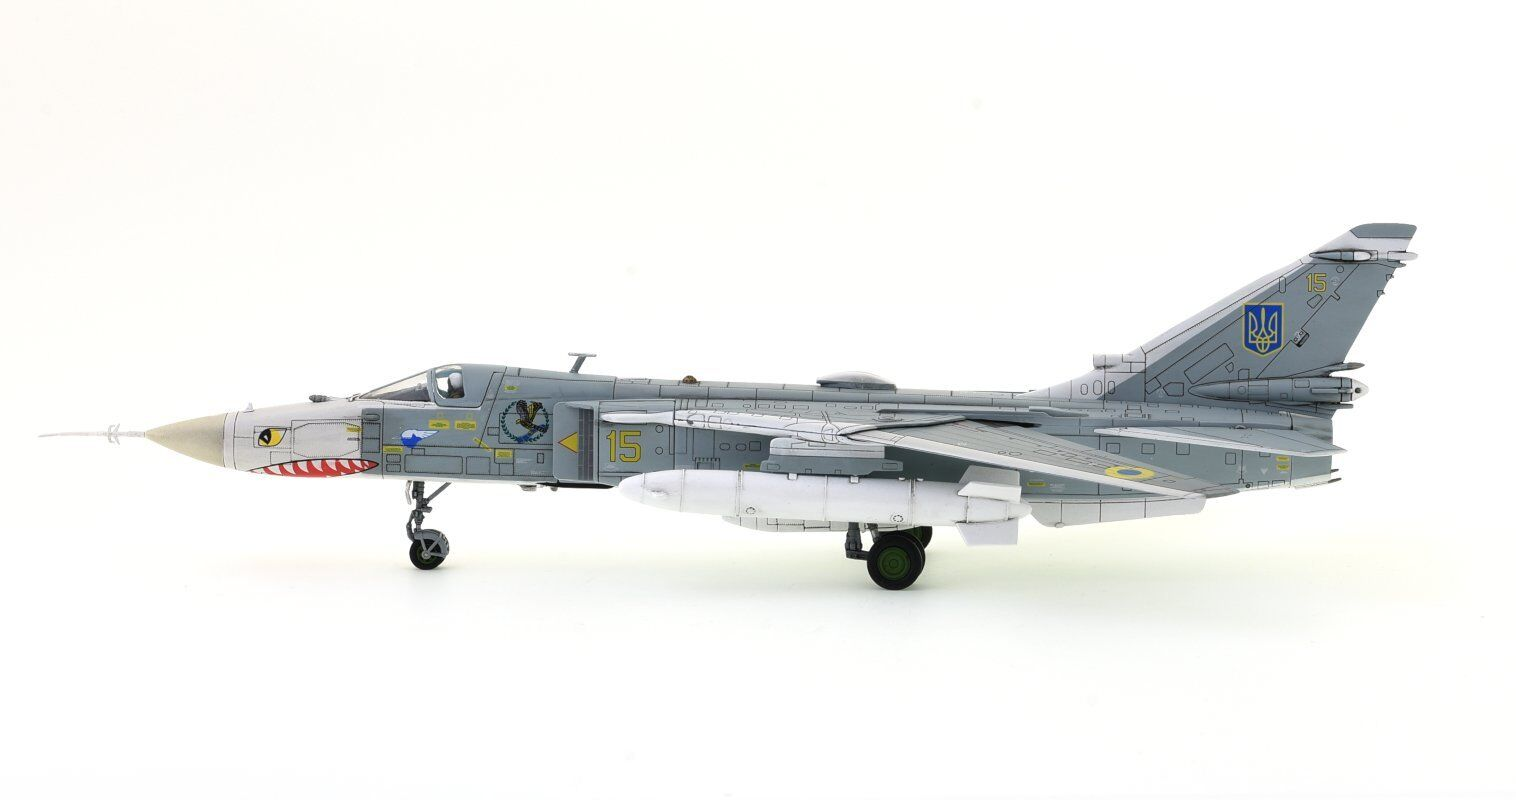 CALIBRE WINGS CA722402 SUKHOI SU-24MR FENCER, YELLOW 15 UKRAINE AIR FORCE